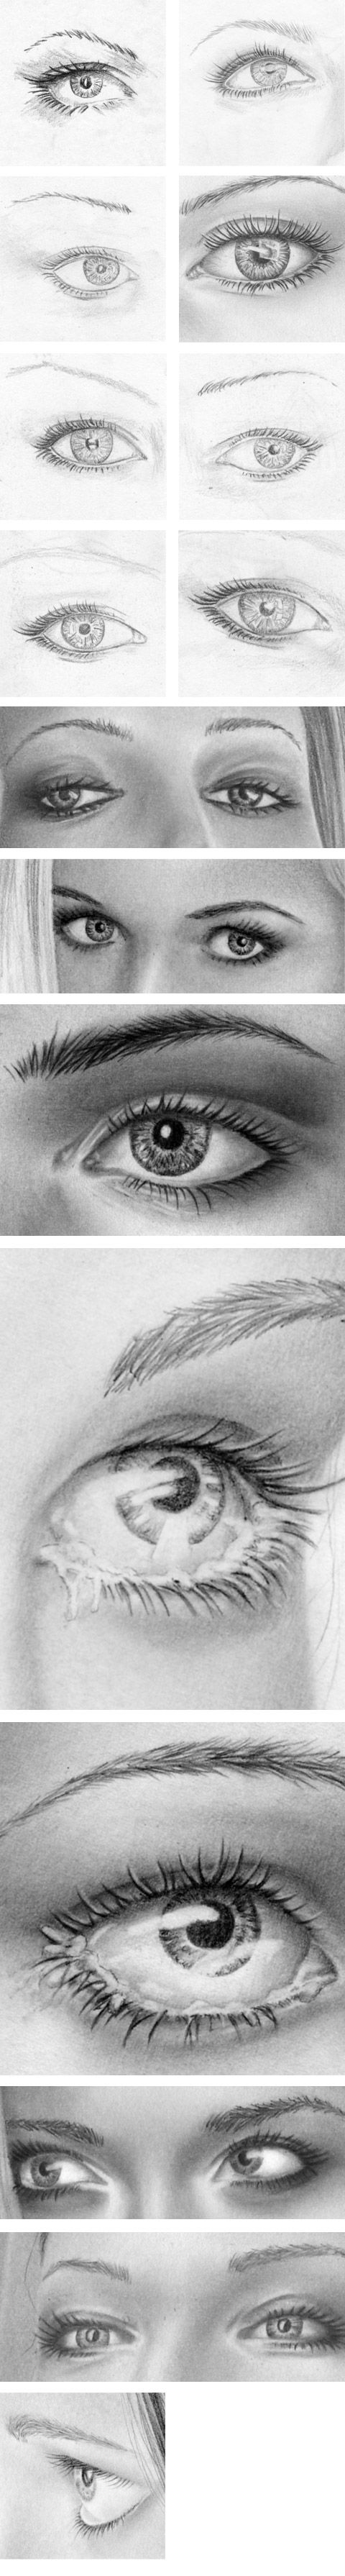 I love eye drawings